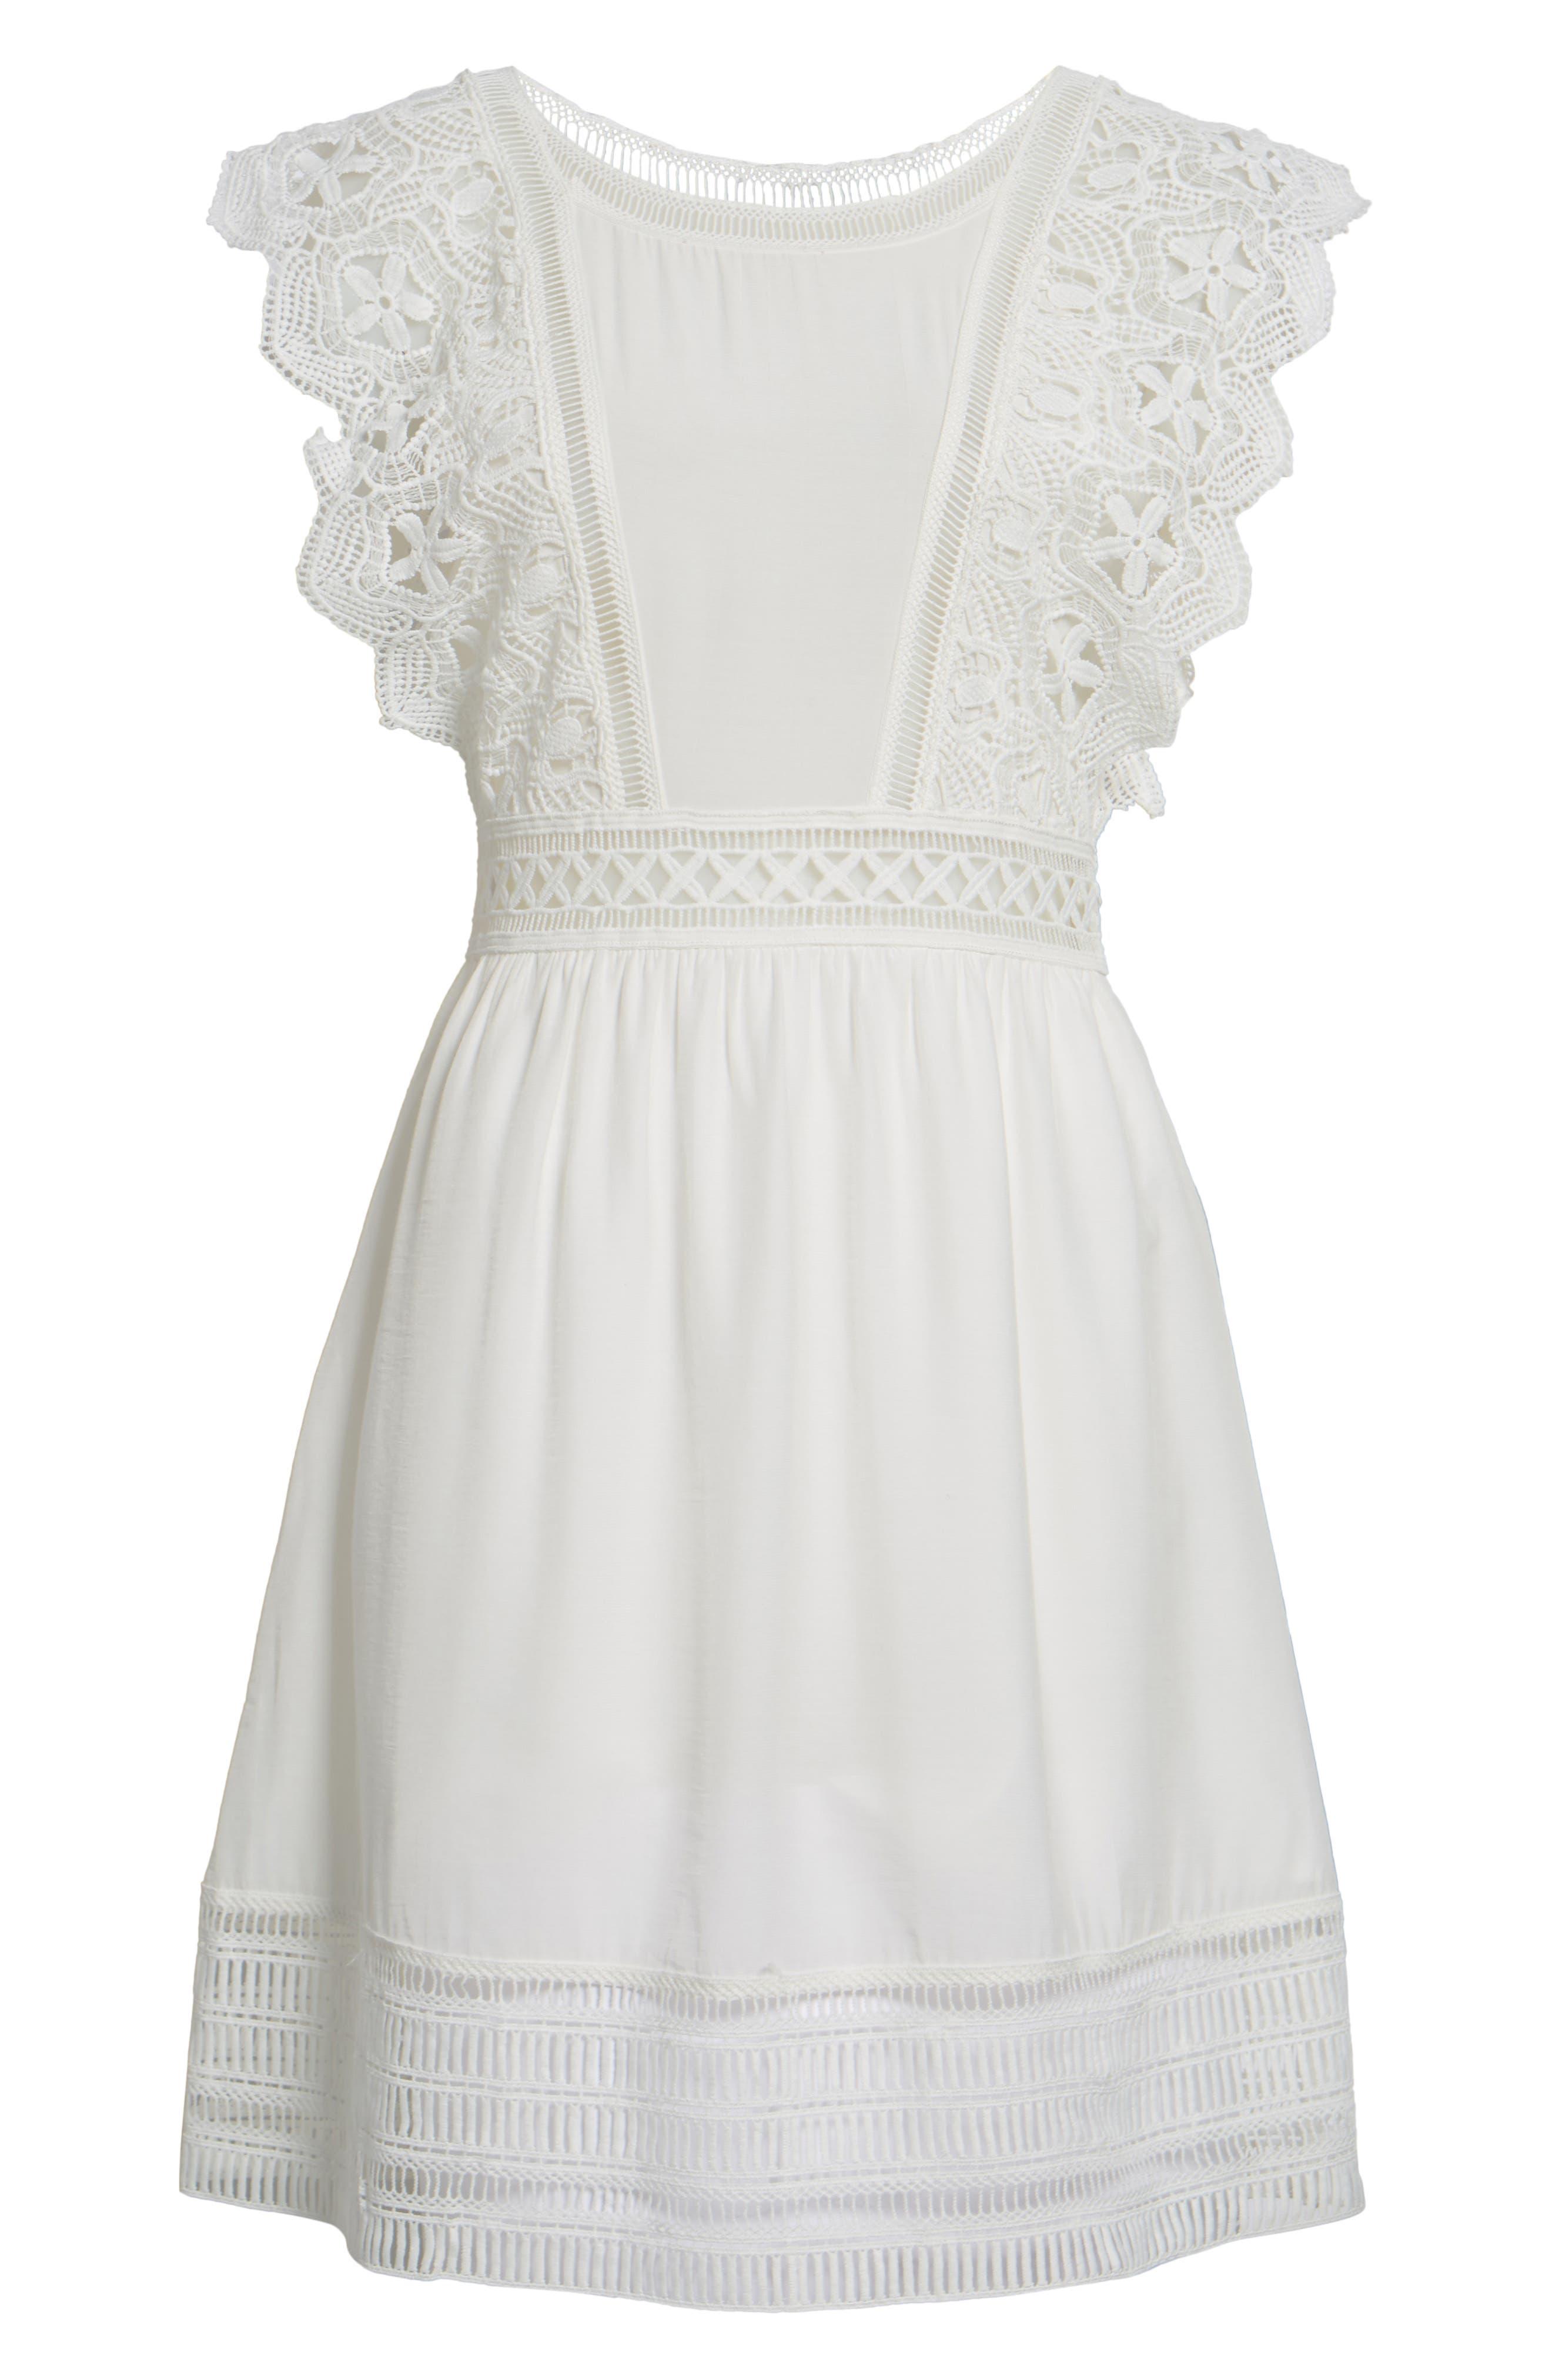 Lace Trim Babydoll Dress,                             Alternate thumbnail 6, color,                             White